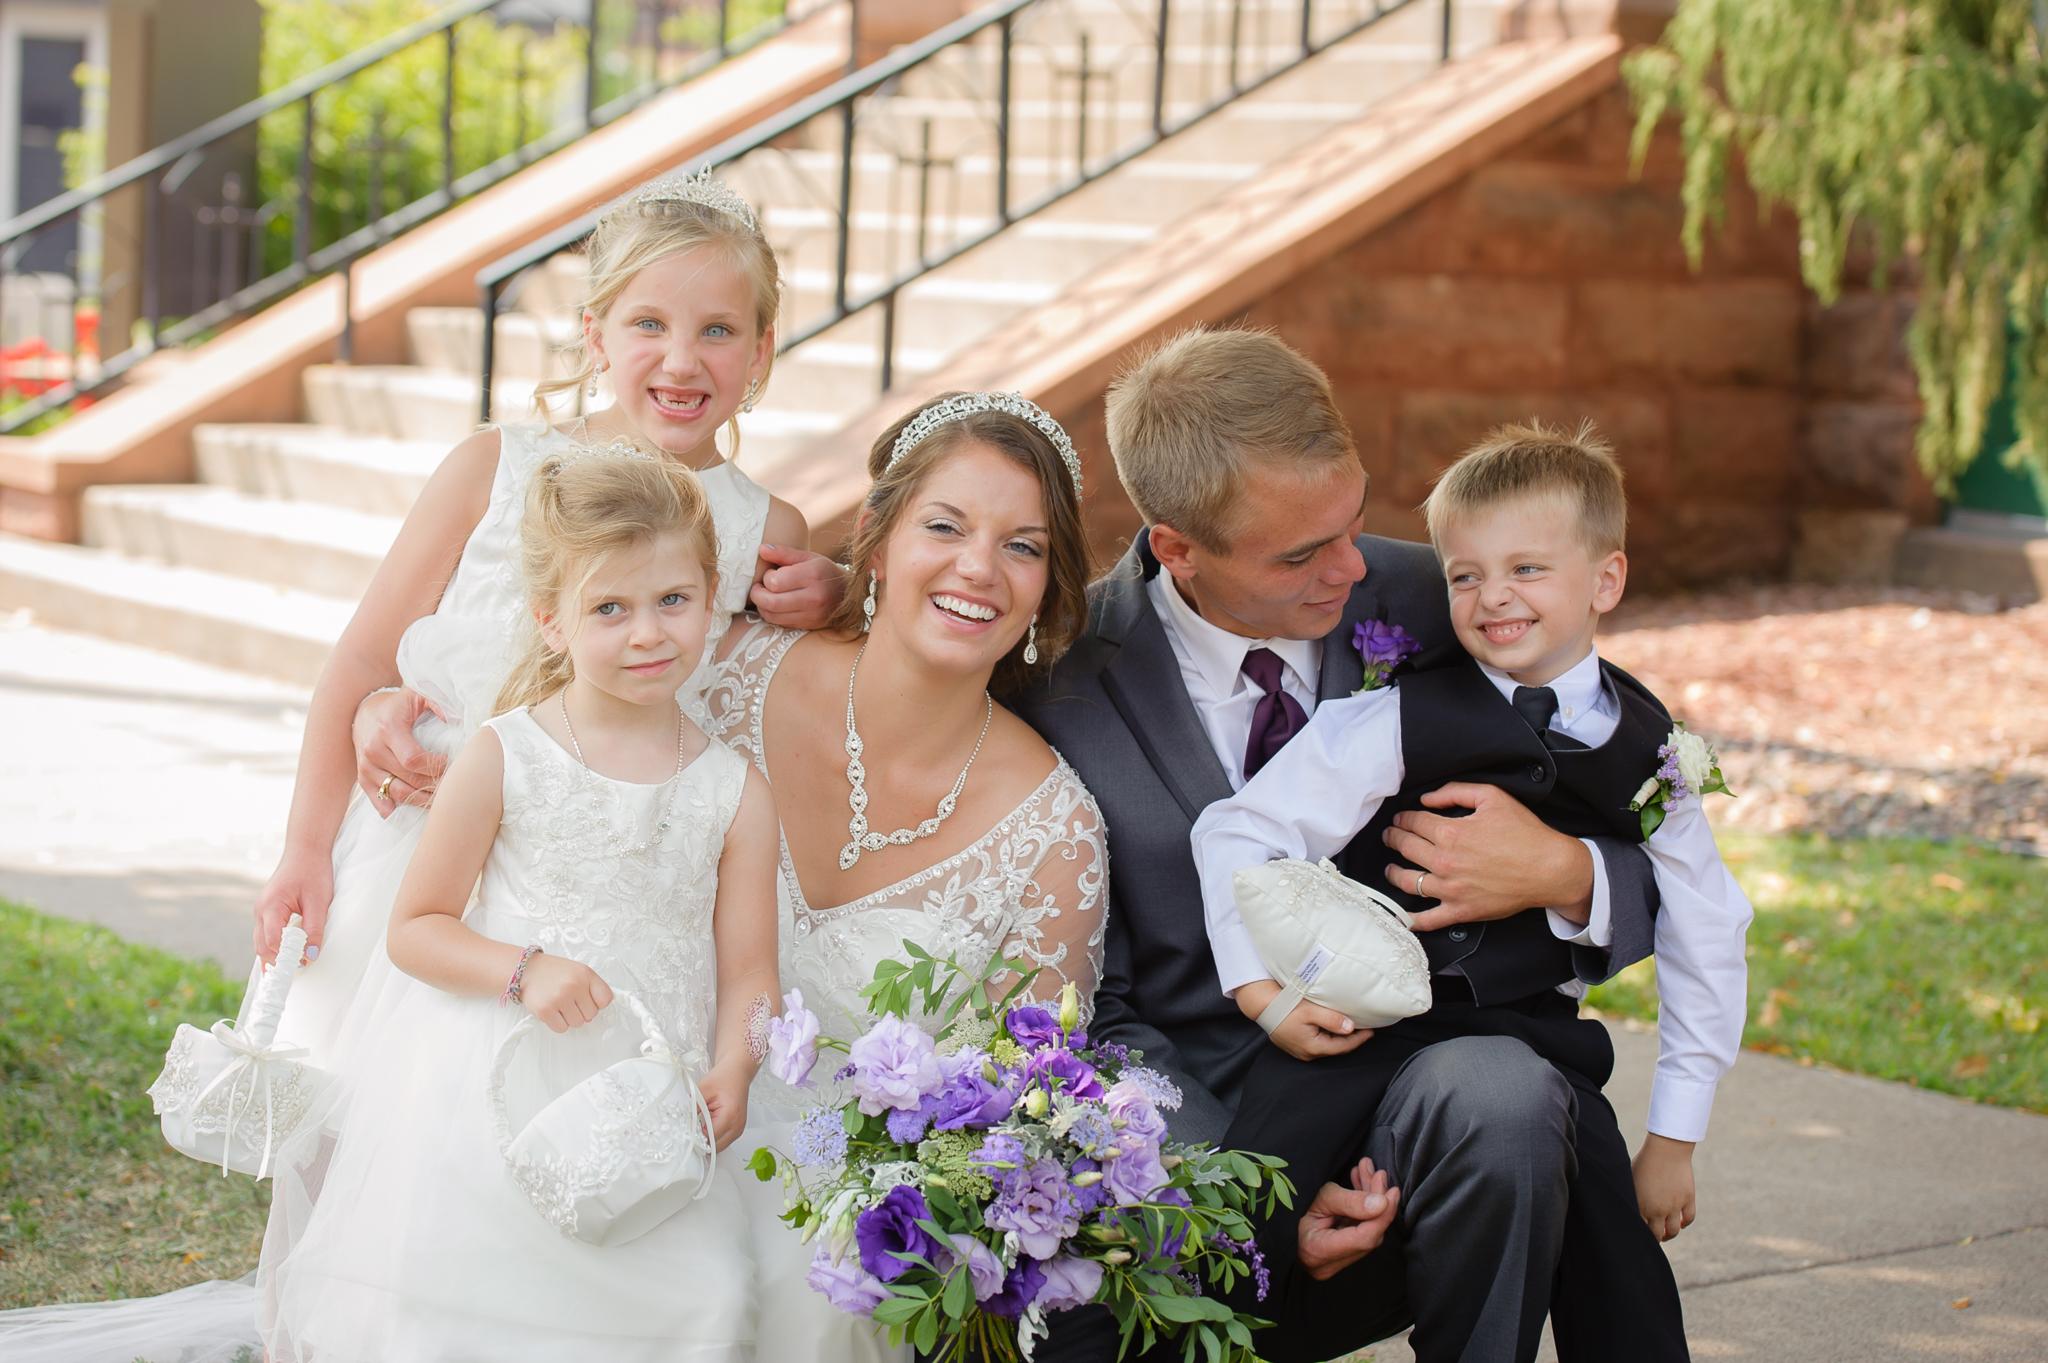 22-ashland washburn wedding photography700_5210.jpg